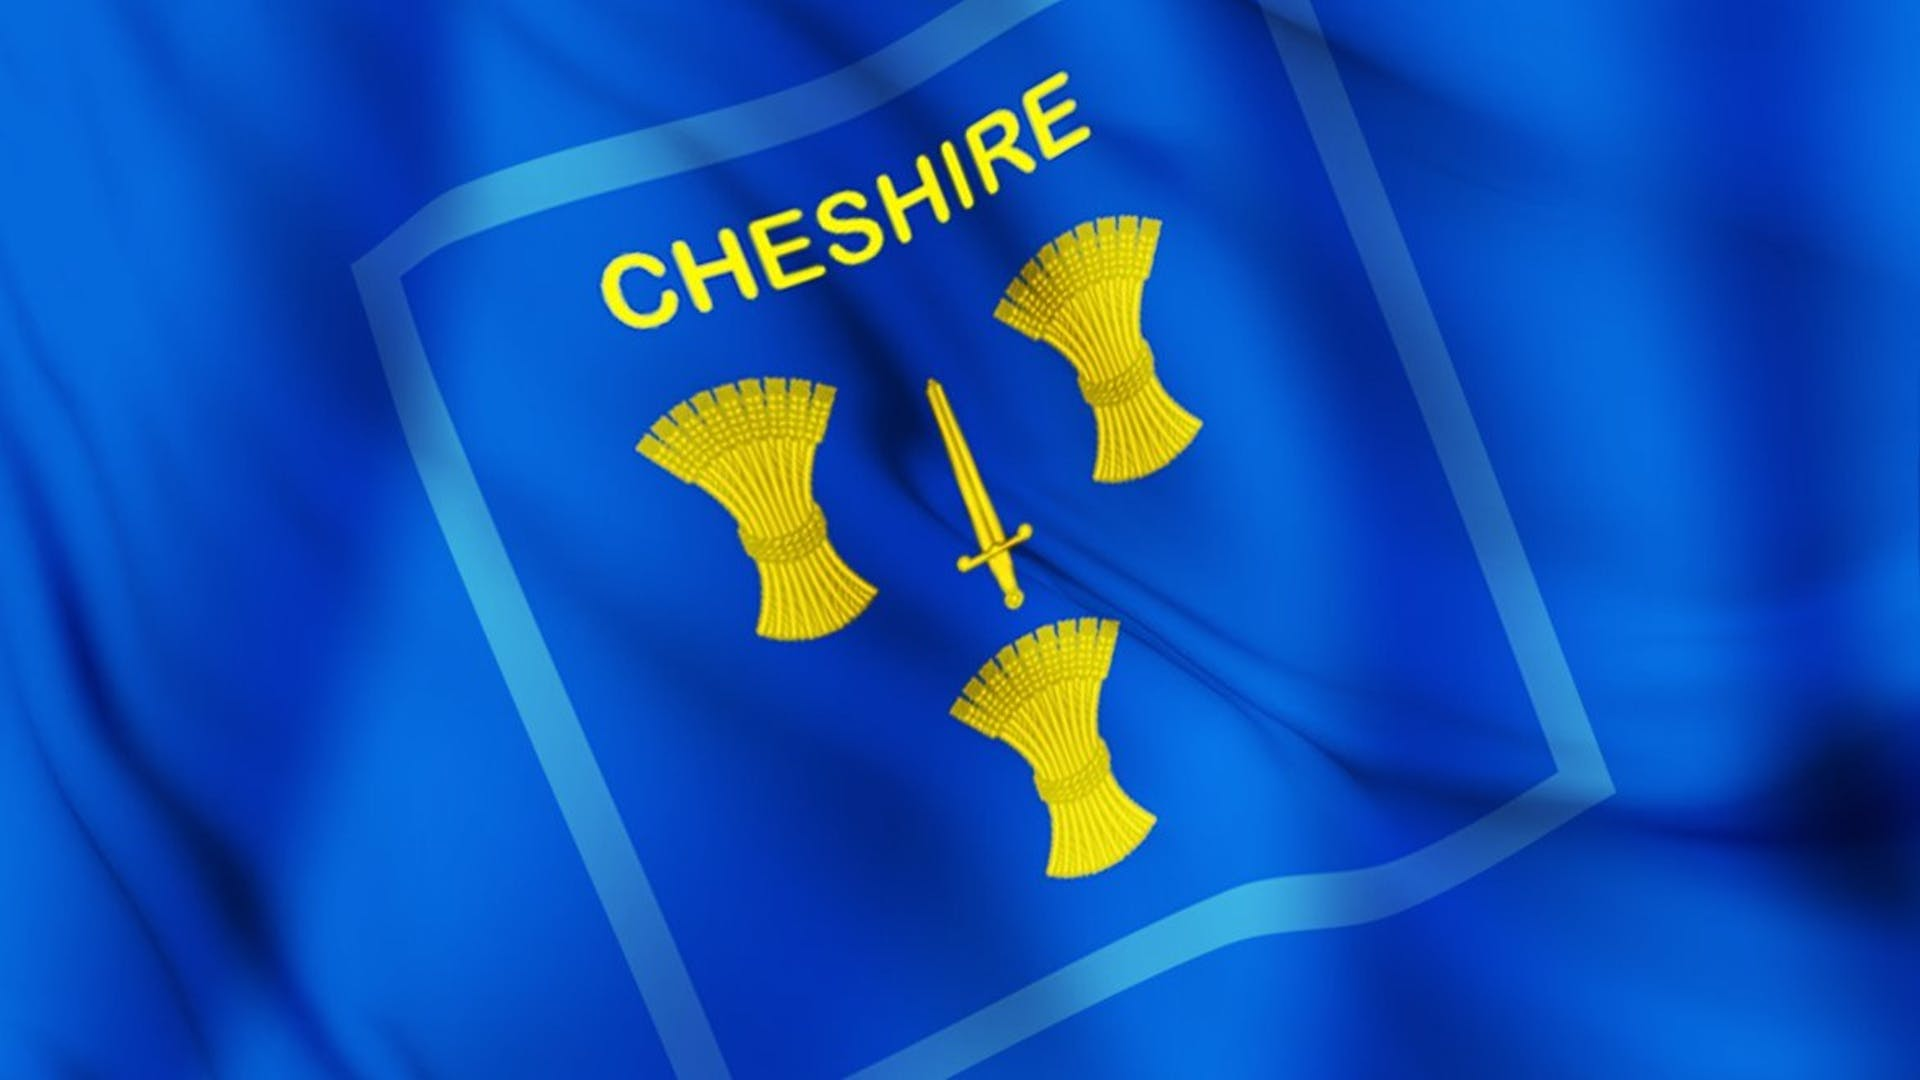 Cheshire flag logo